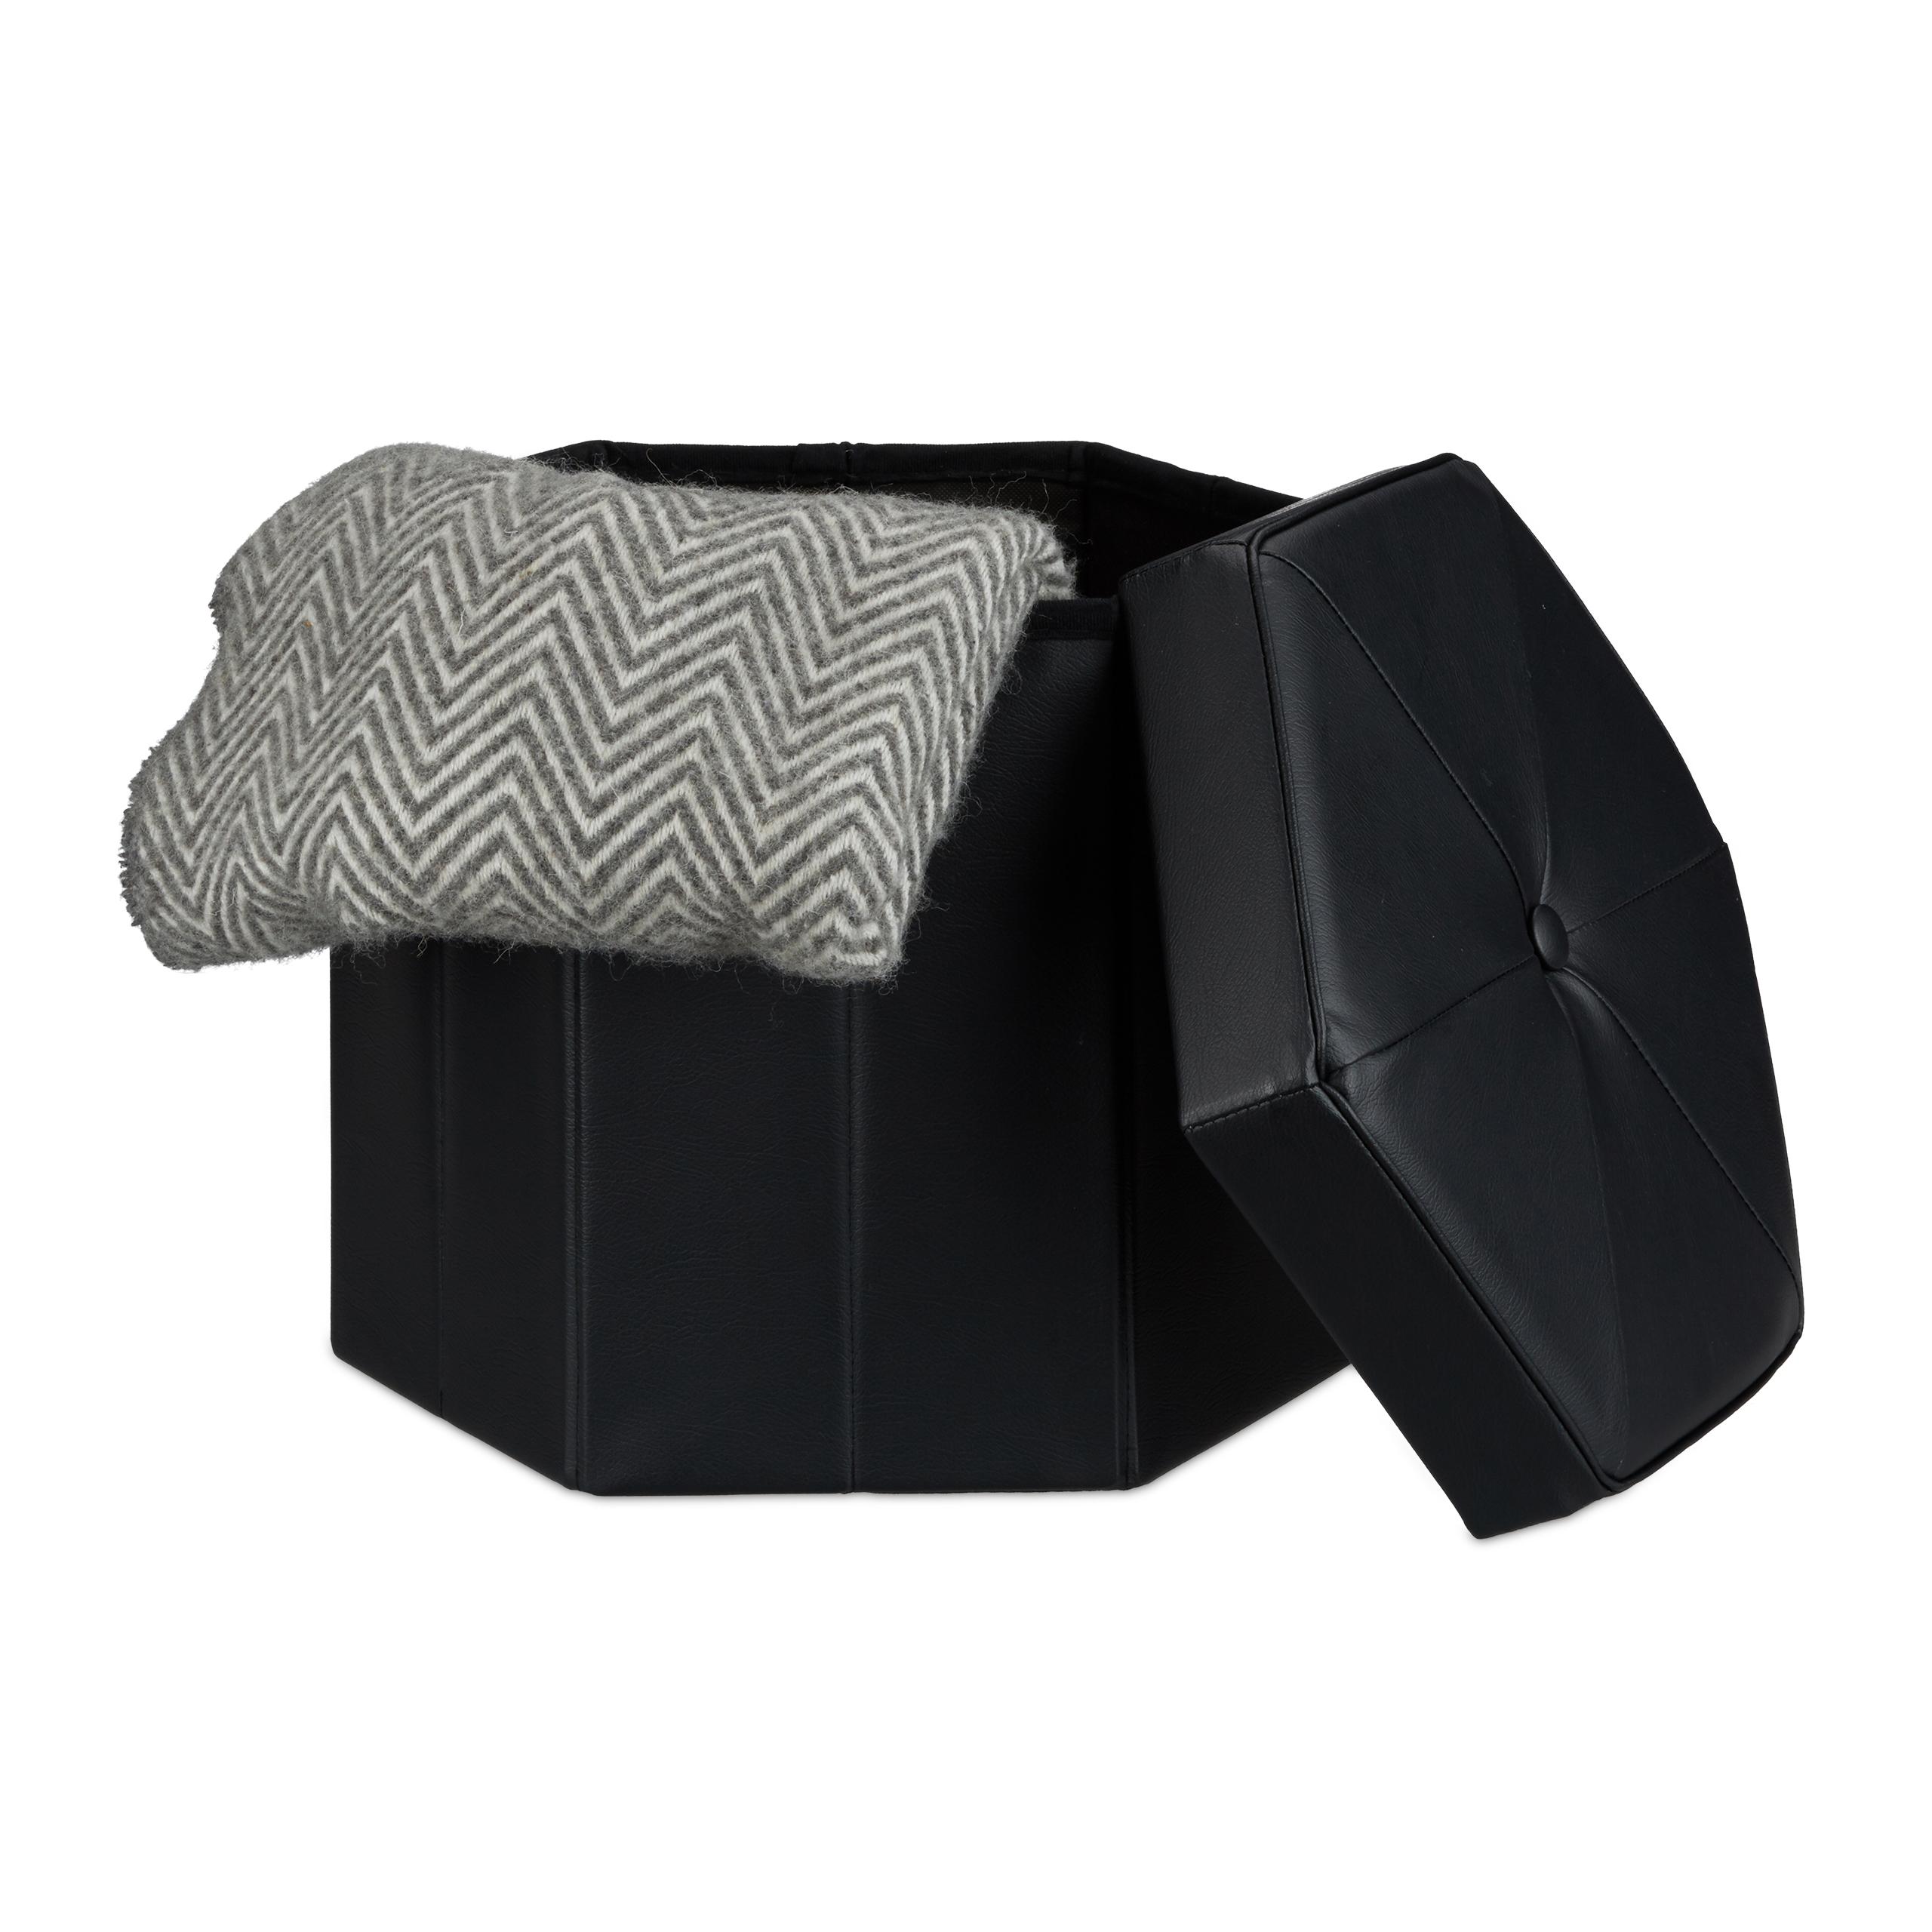 faltbarer sitzhocker sechseckig mit stauraum sitzhocker sitzw rfel kunstleder ebay. Black Bedroom Furniture Sets. Home Design Ideas